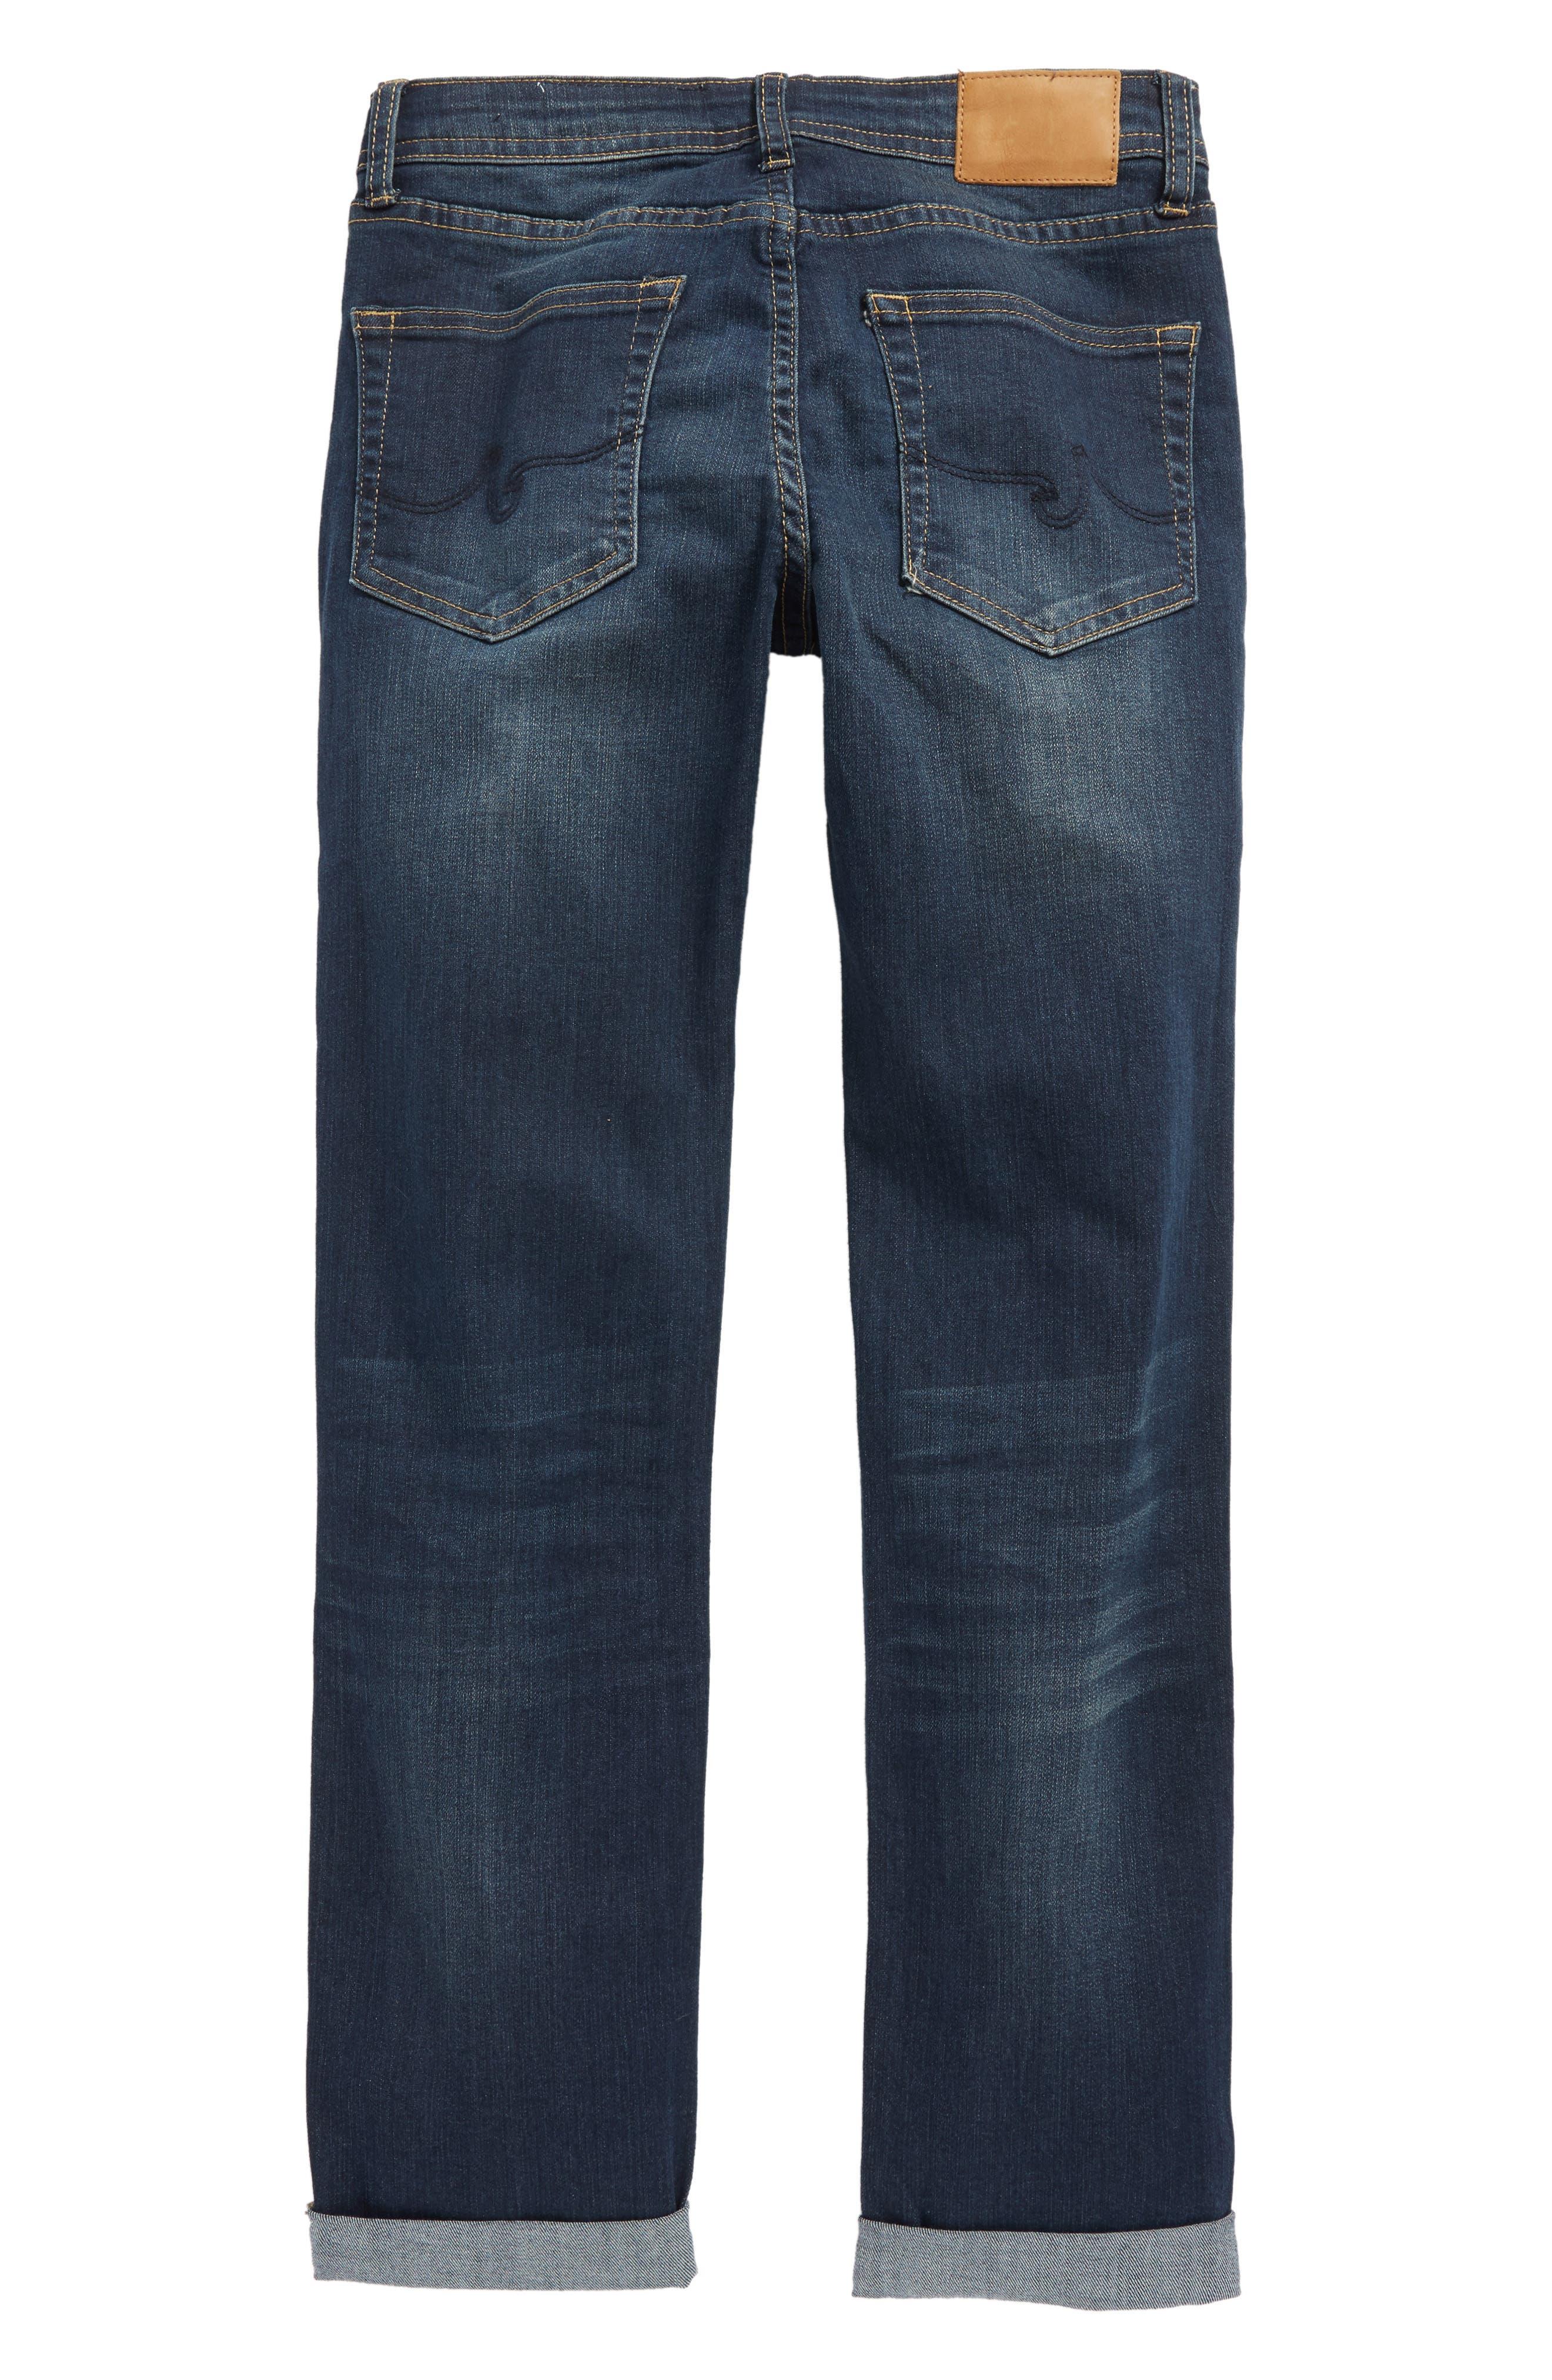 Alternate Image 2  - AG The James Slim Straight Leg Jeans (Big Boys)